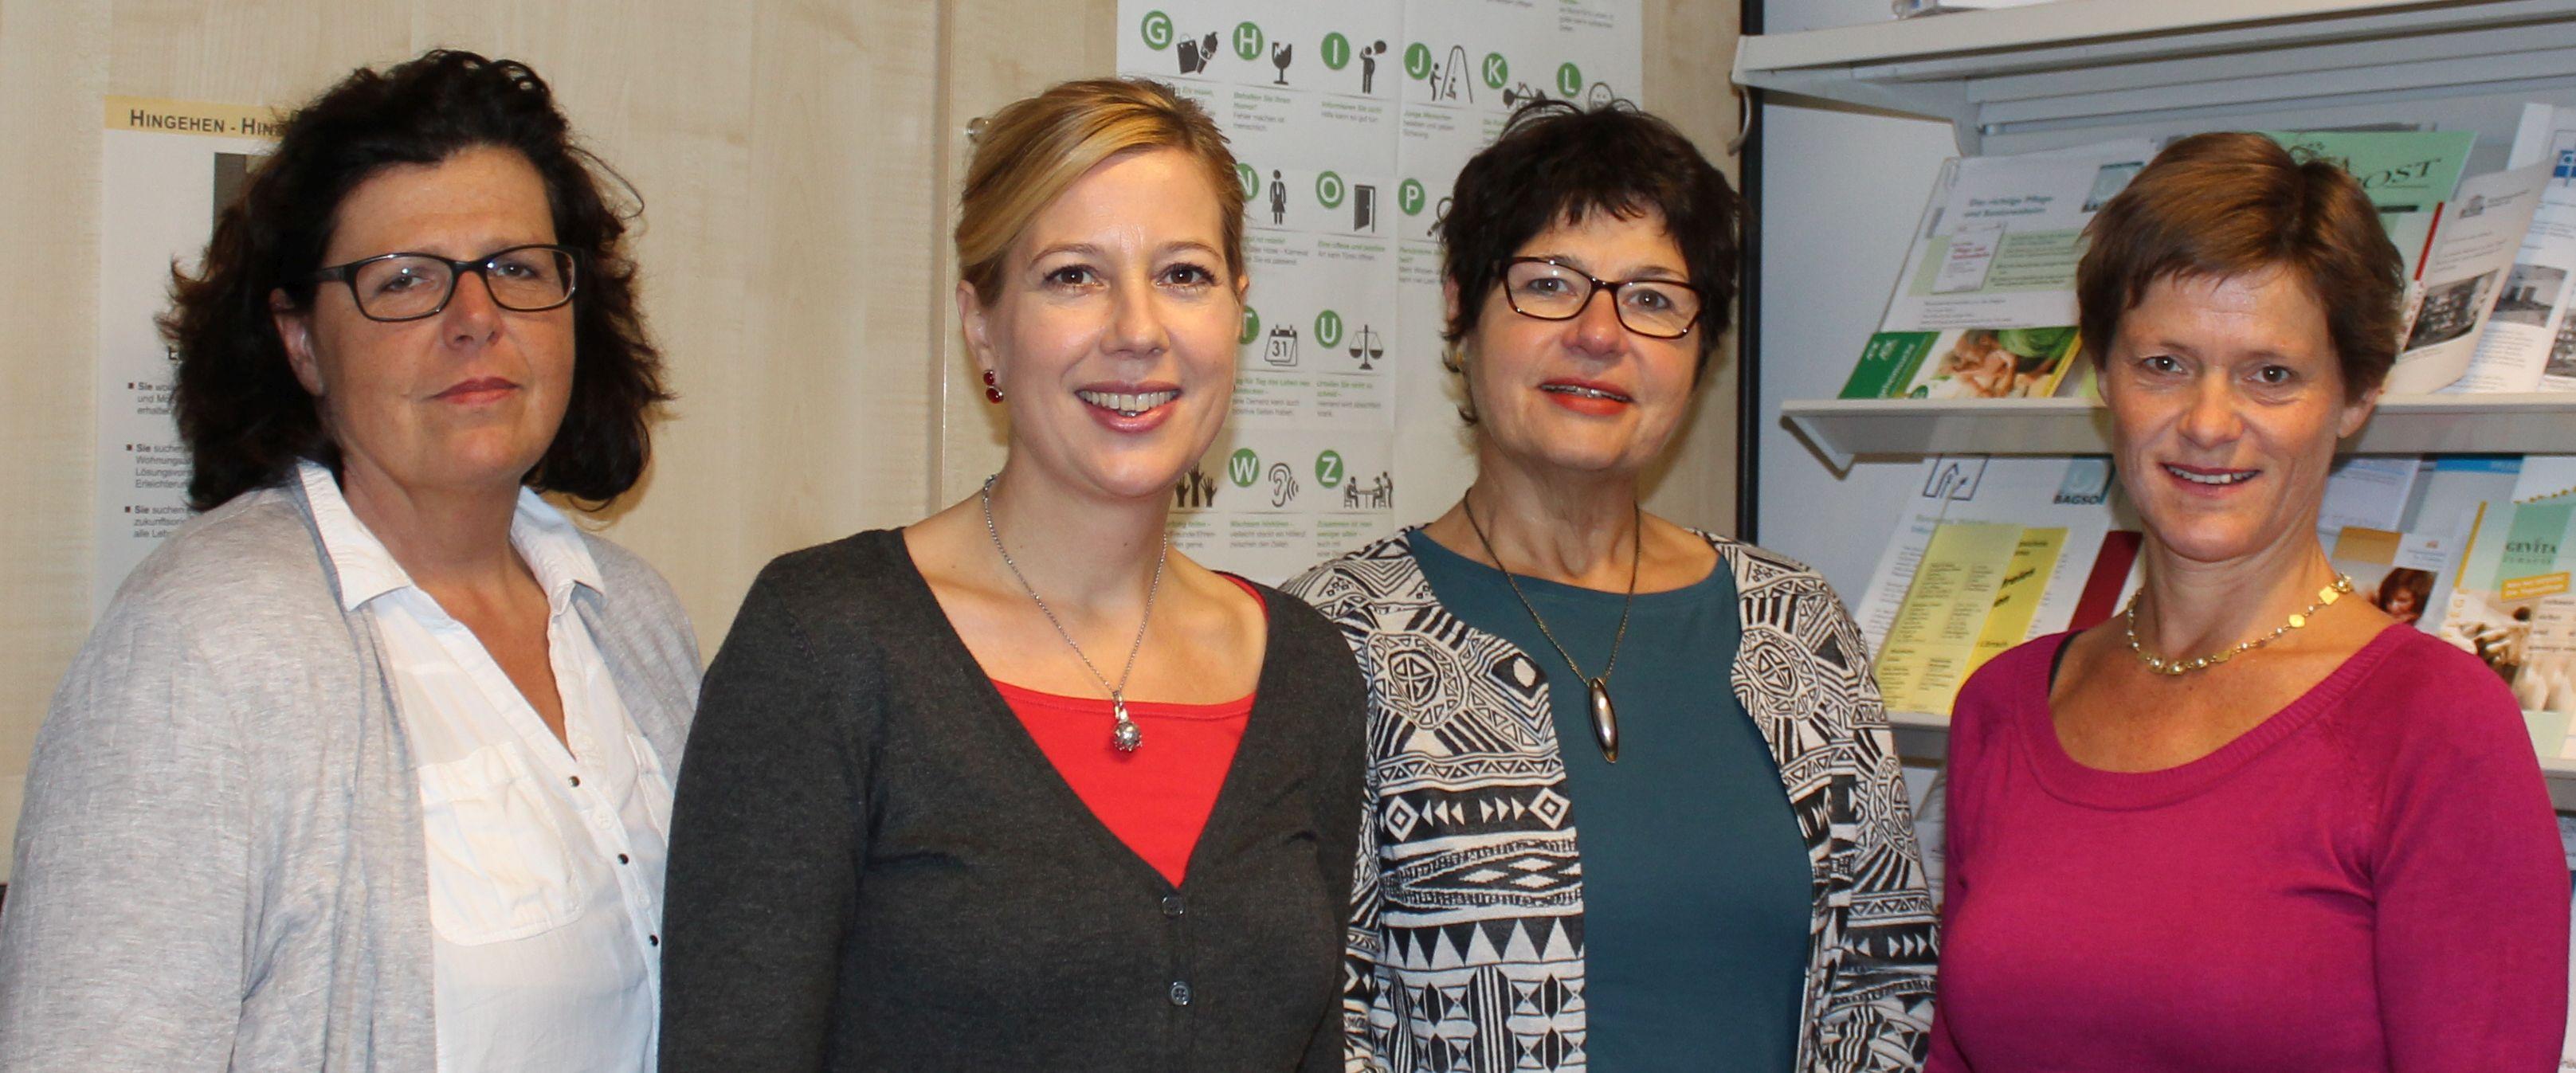 Team des Pflegestützpunkts Landkreis Lörrach